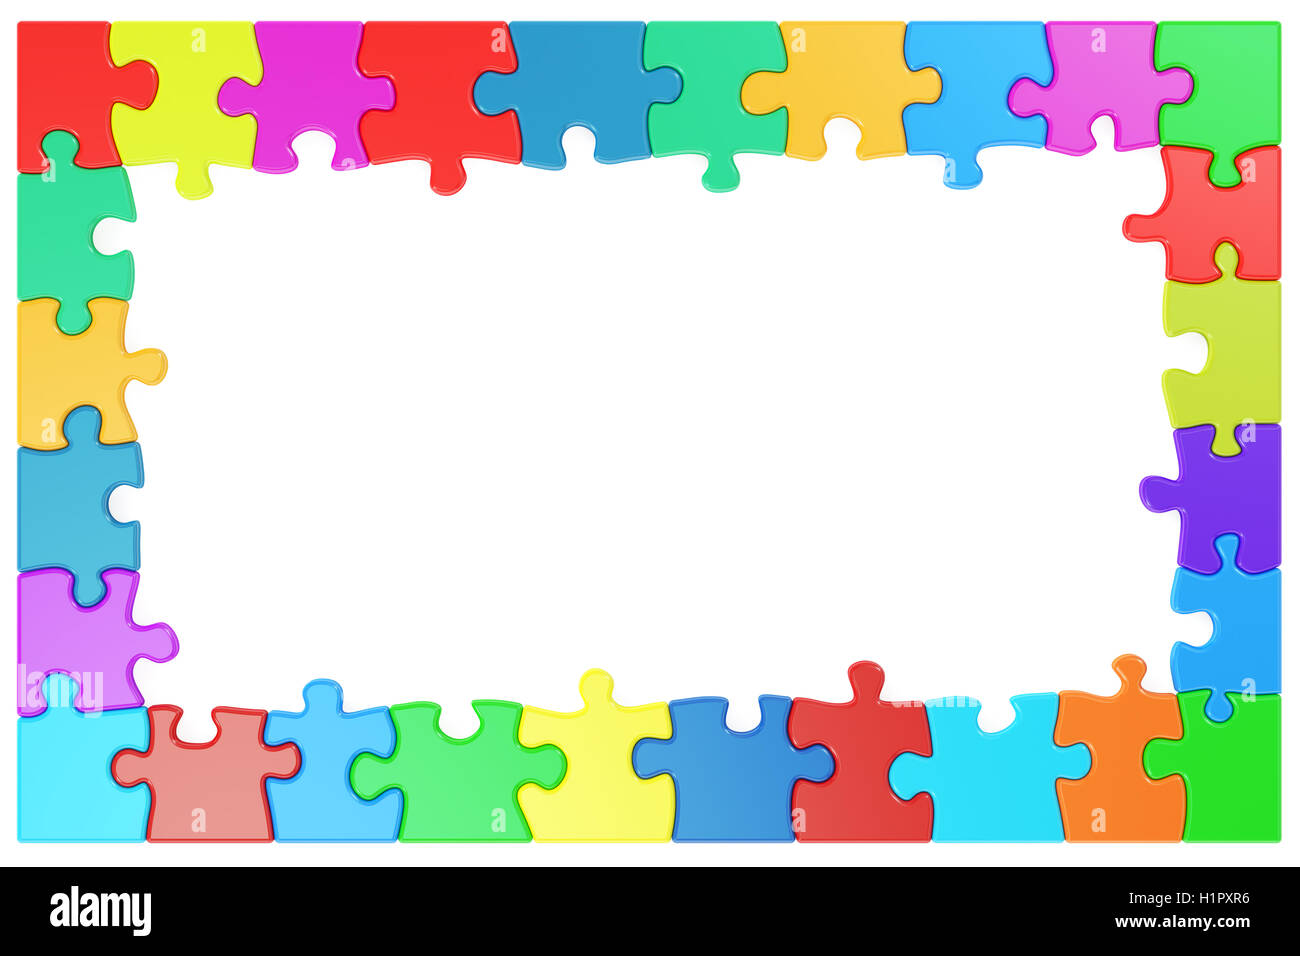 Rahmen aus farbigen Puzzle-Teile, 3D rendering Stockfoto, Bild ...